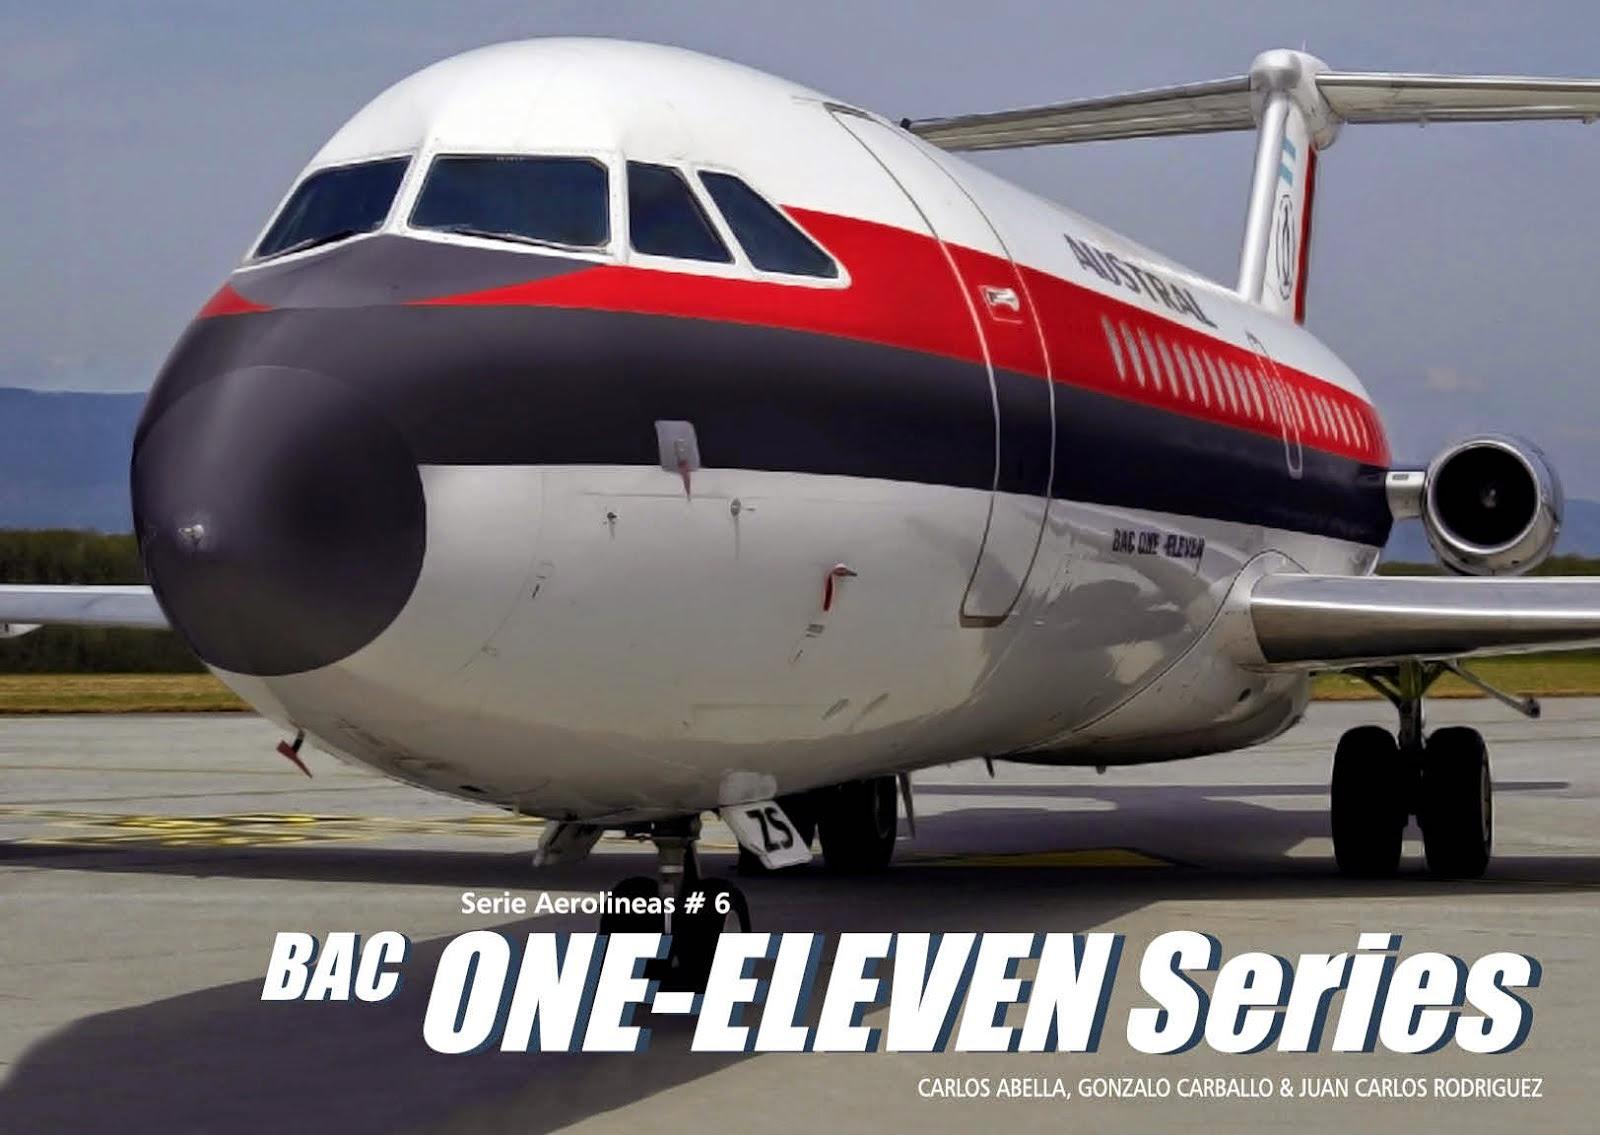 Serie Aerolineas #6 BAC 111 Series en  Sudamérica